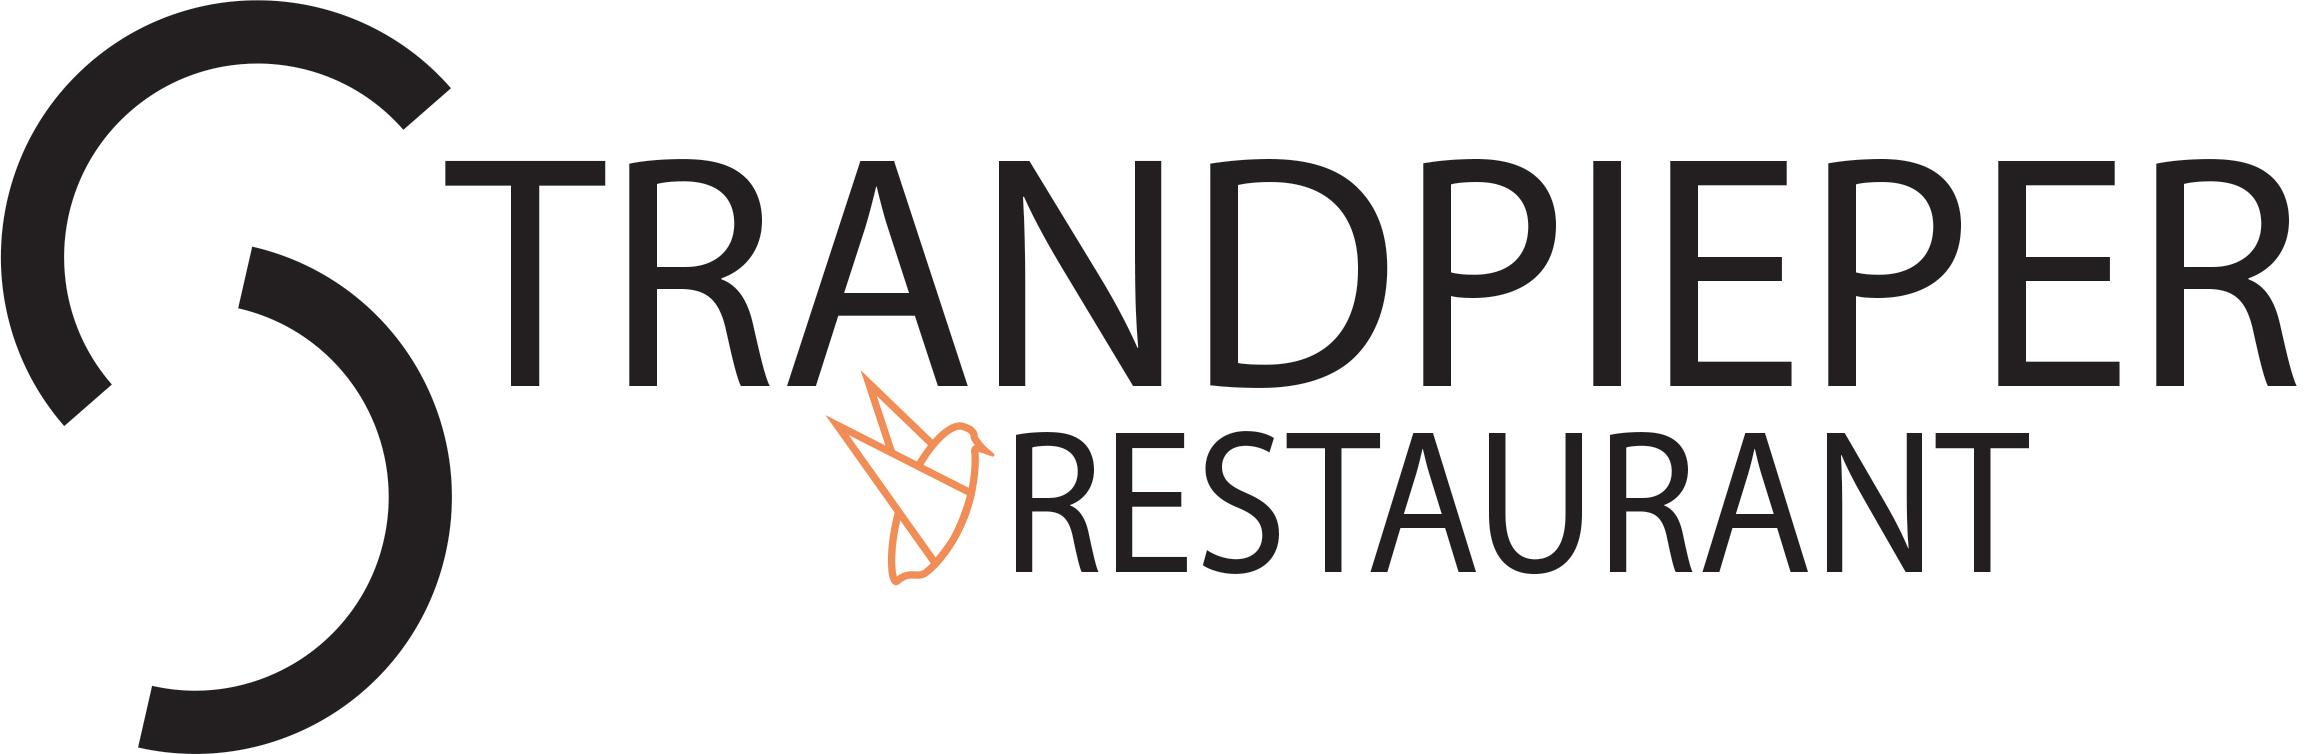 Strandpieper - Restaurant Norderney